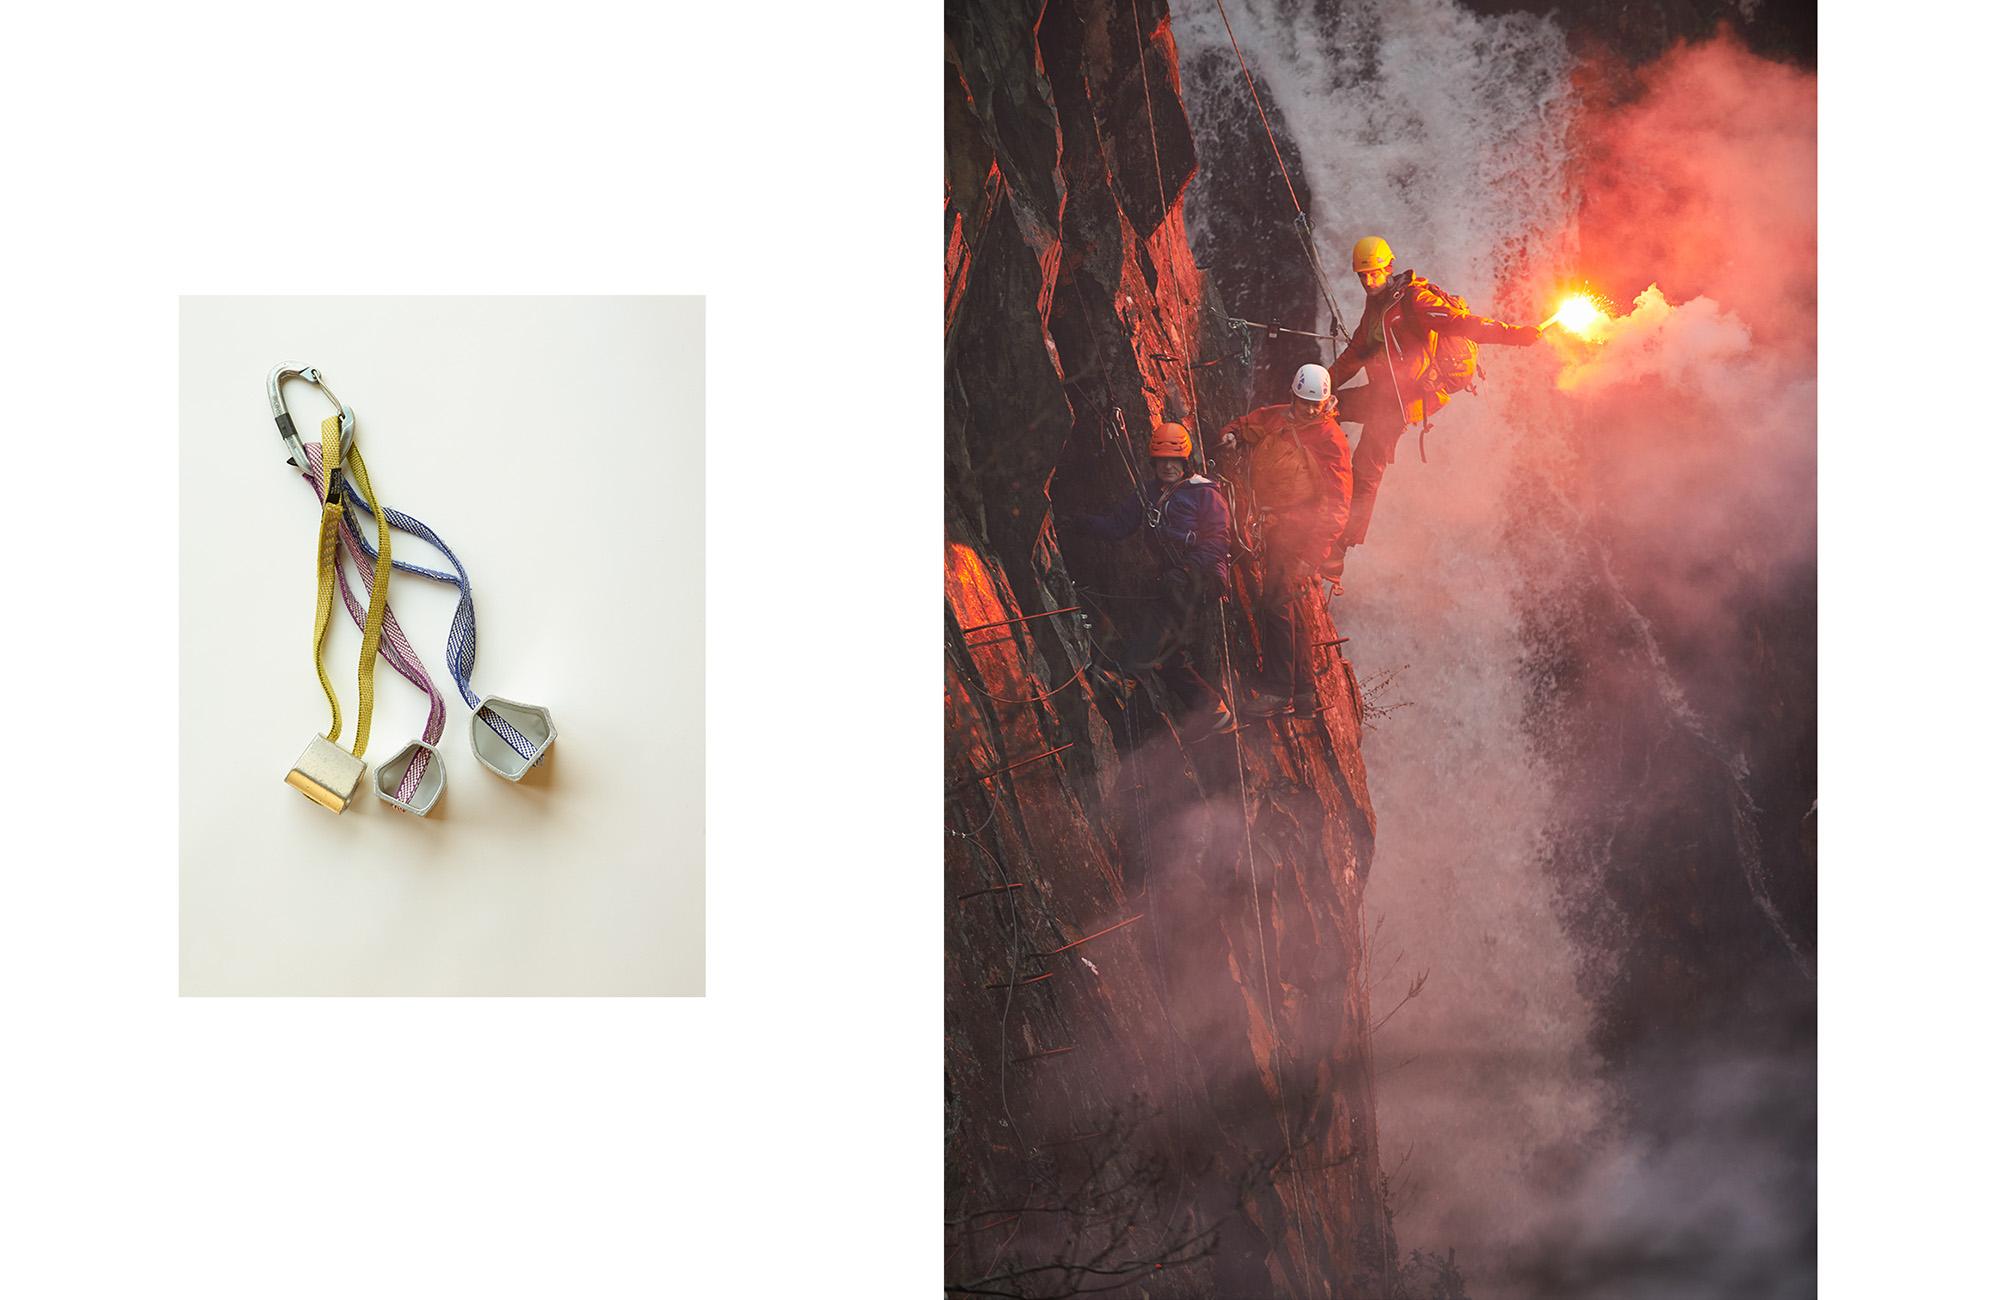 Hole and Corner | Glencoe Rescue Team - 11 of 14